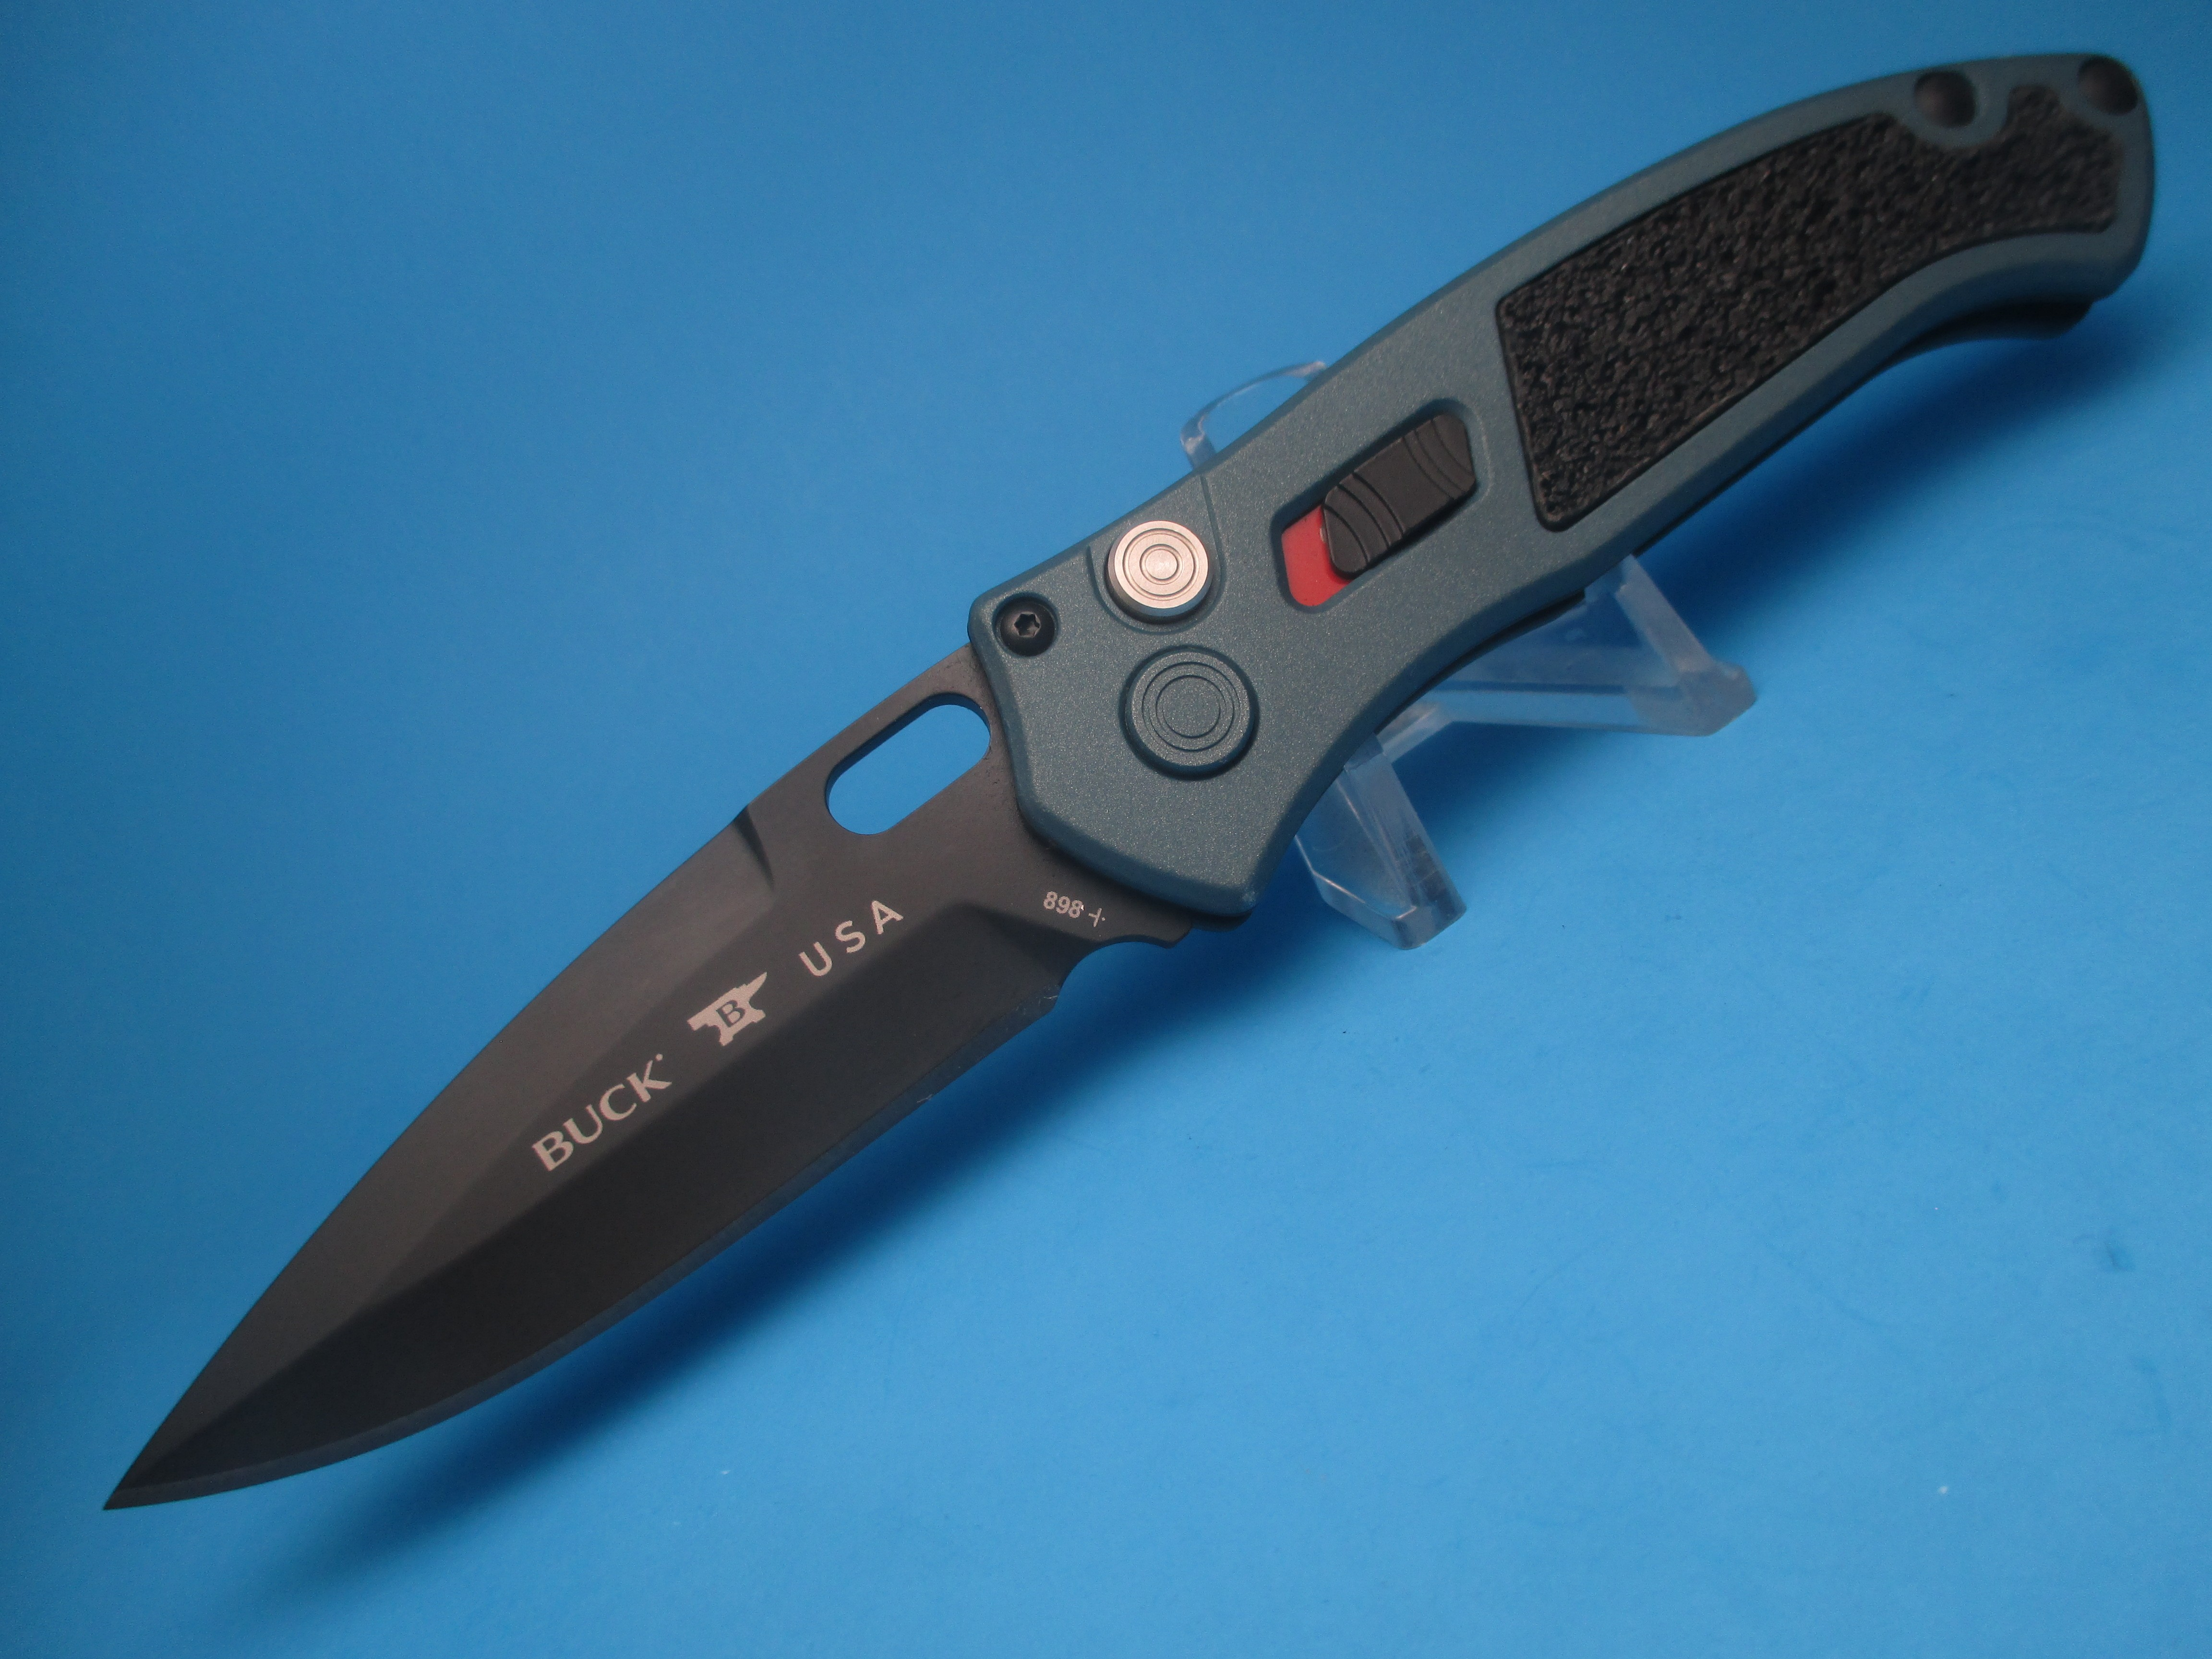 Buck 898 Impact Blue Titanium Switchblade Knife